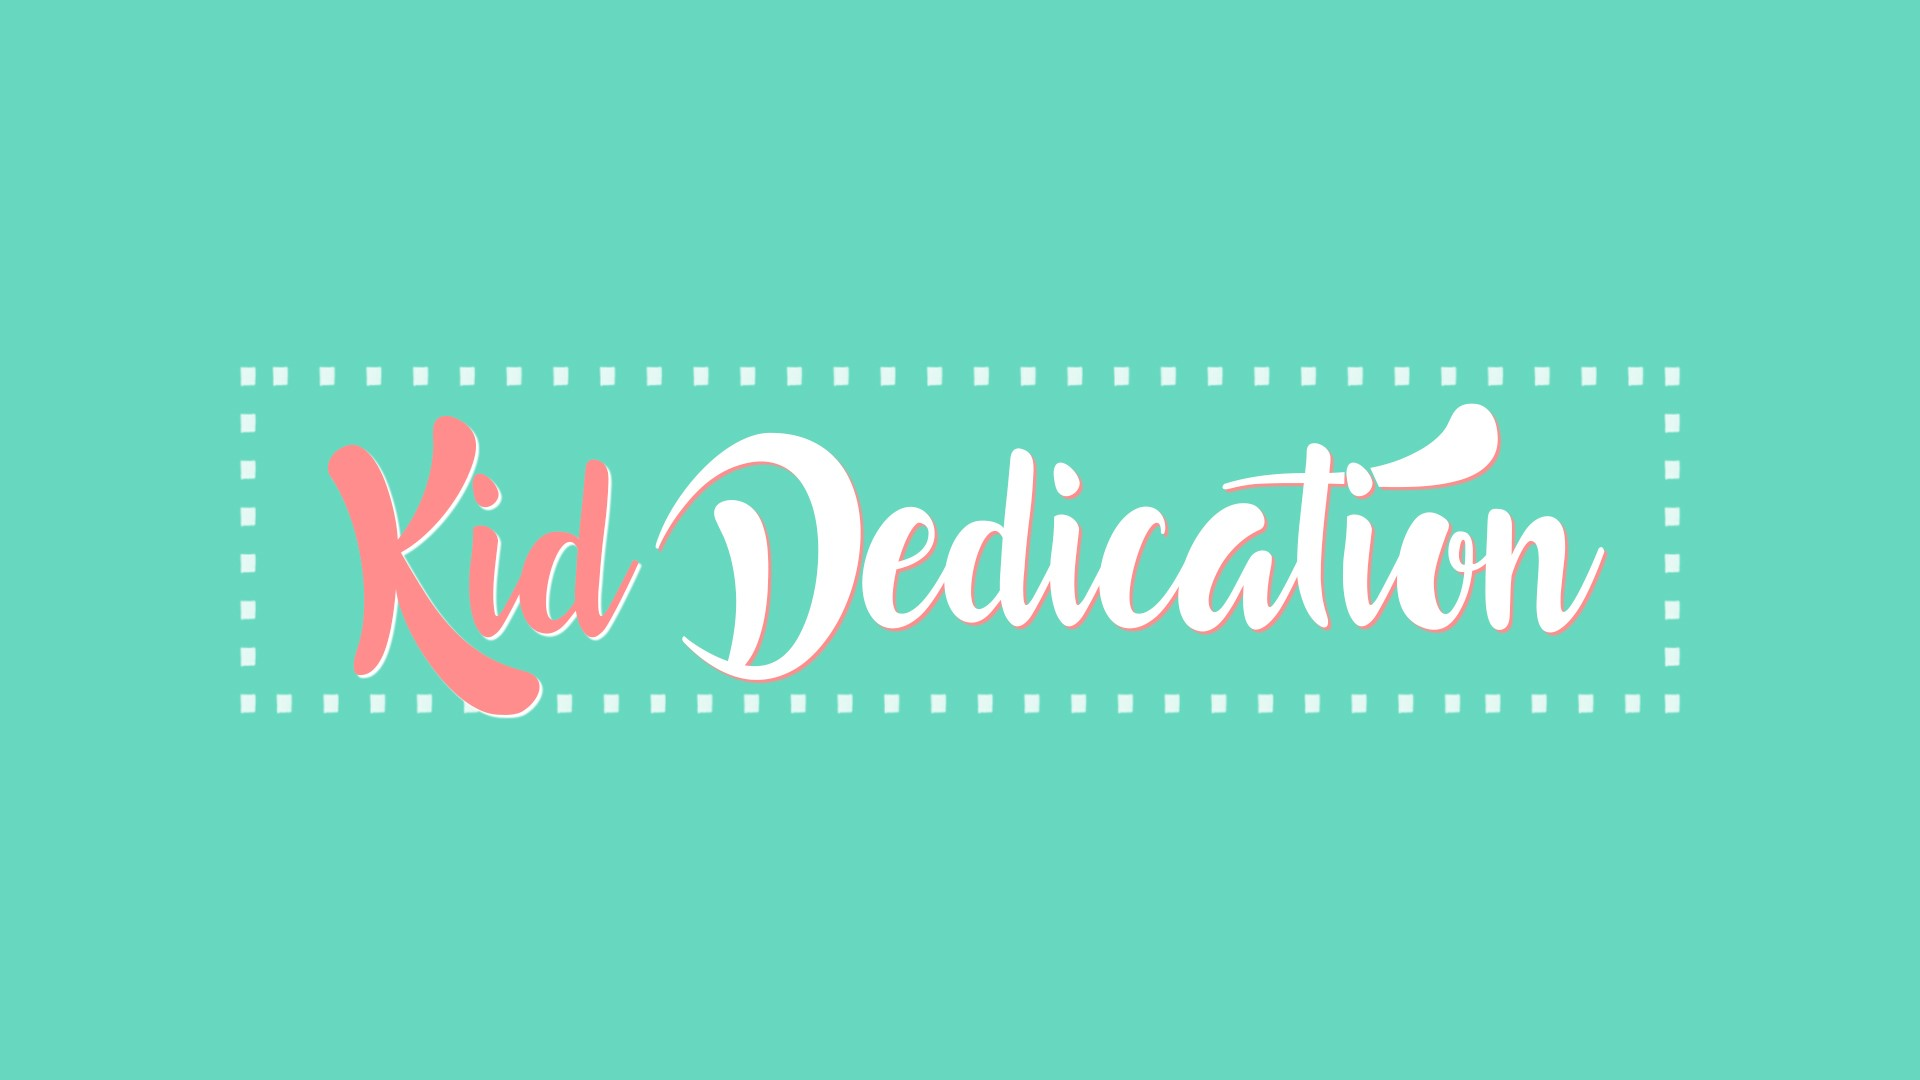 Kid Dedication.jpg